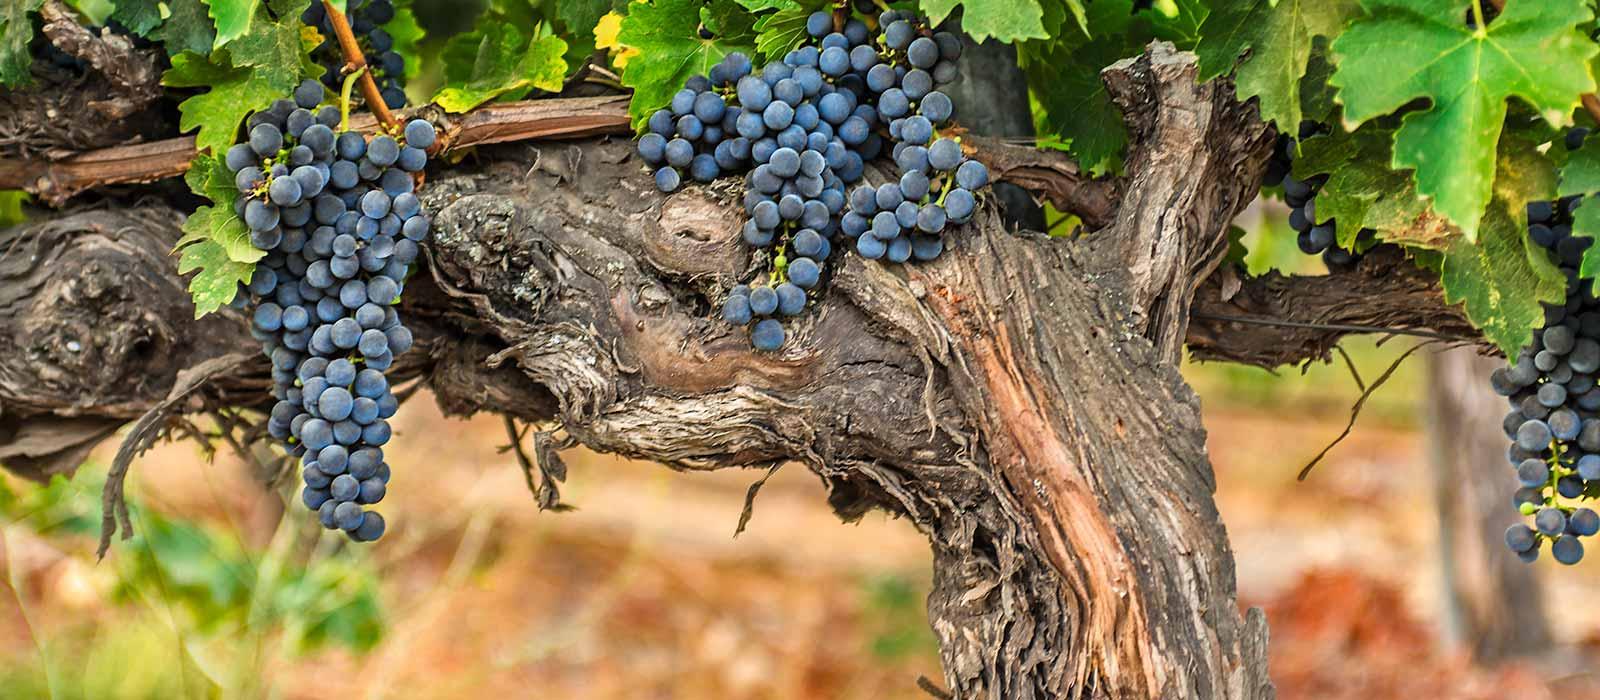 vines_and_fruit_crop